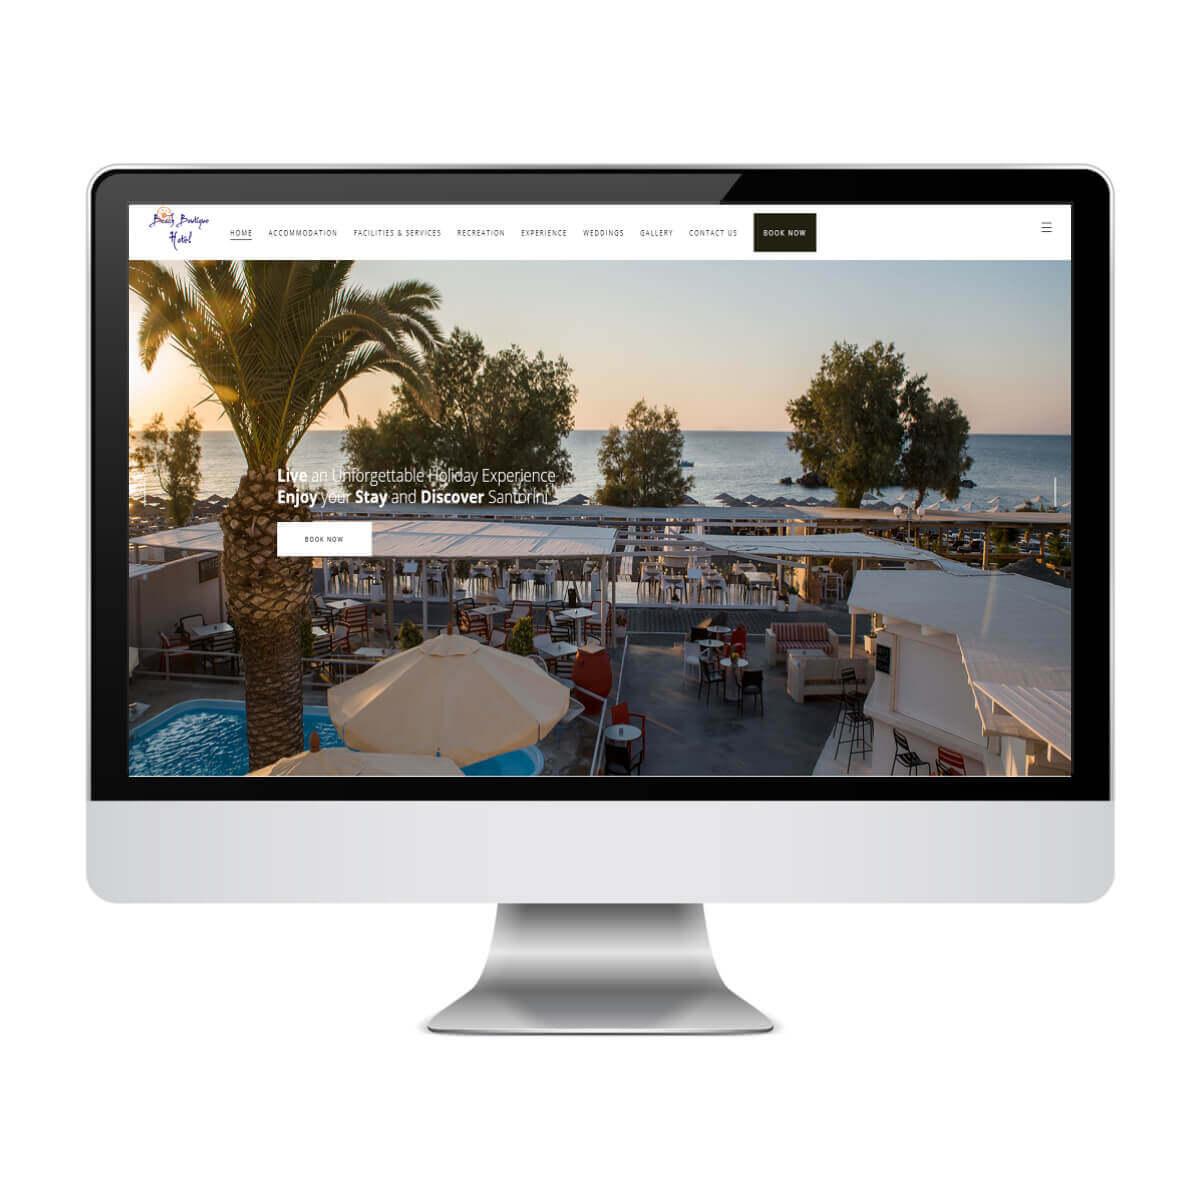 Beach Boutique Hotel - Κατασκευή Ιστοσελίδων για Ξενοδοχεία - SmartWebDesign